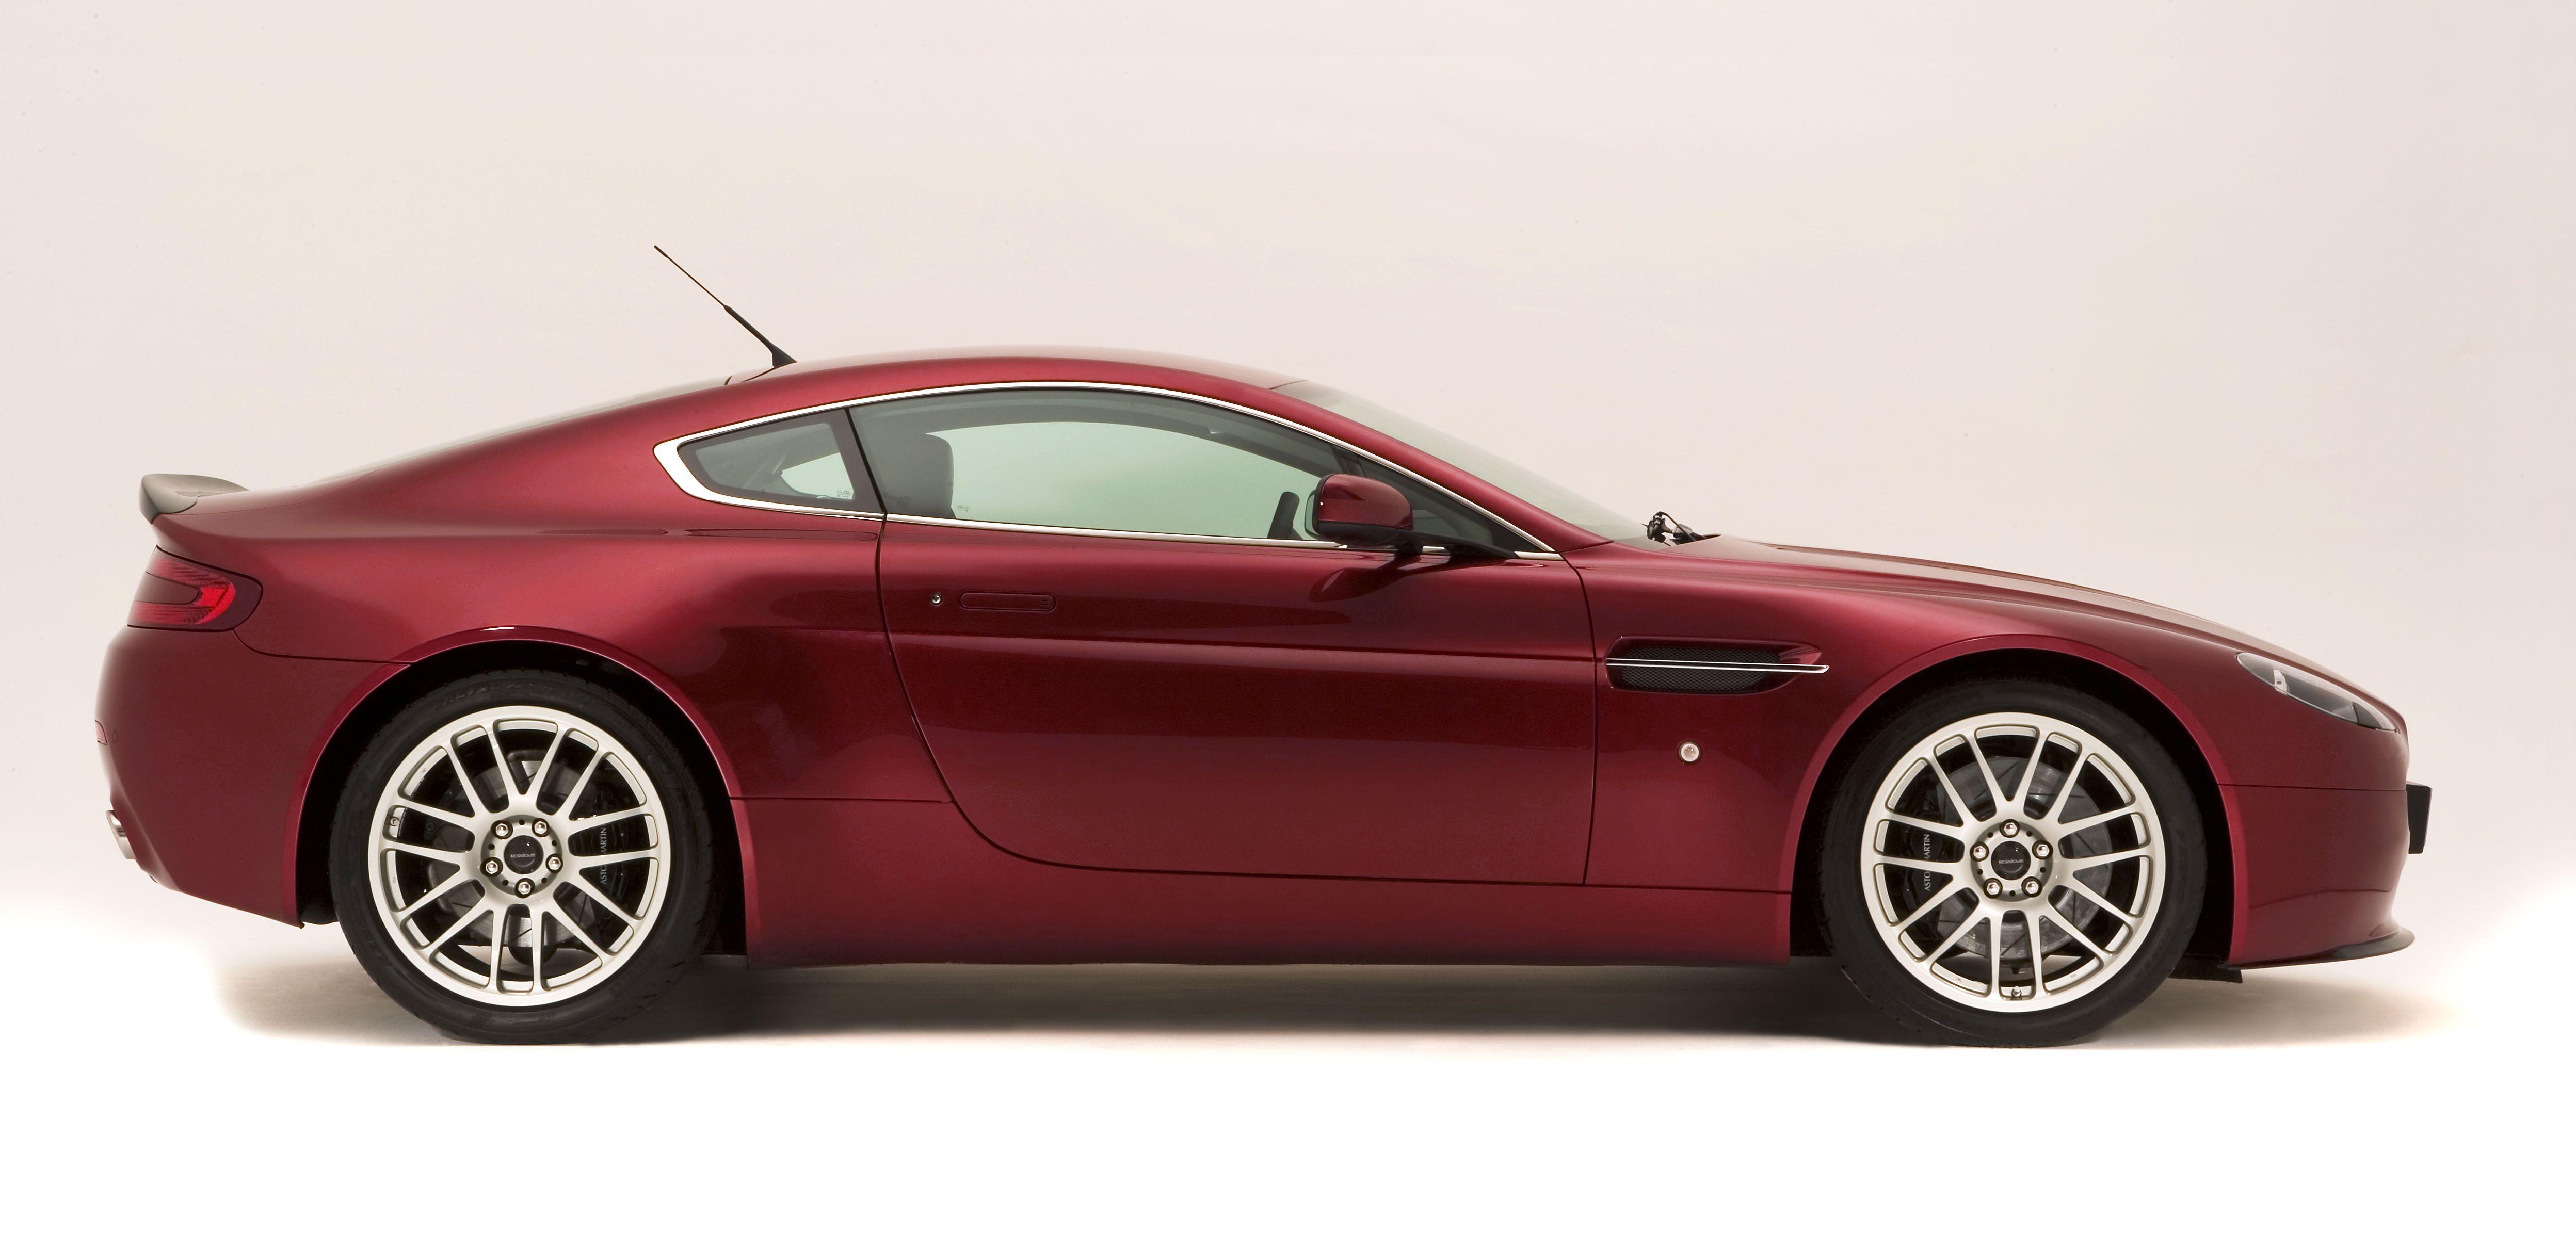 Aston Martin Aston Martin V8 Vantage cars side view tires ...